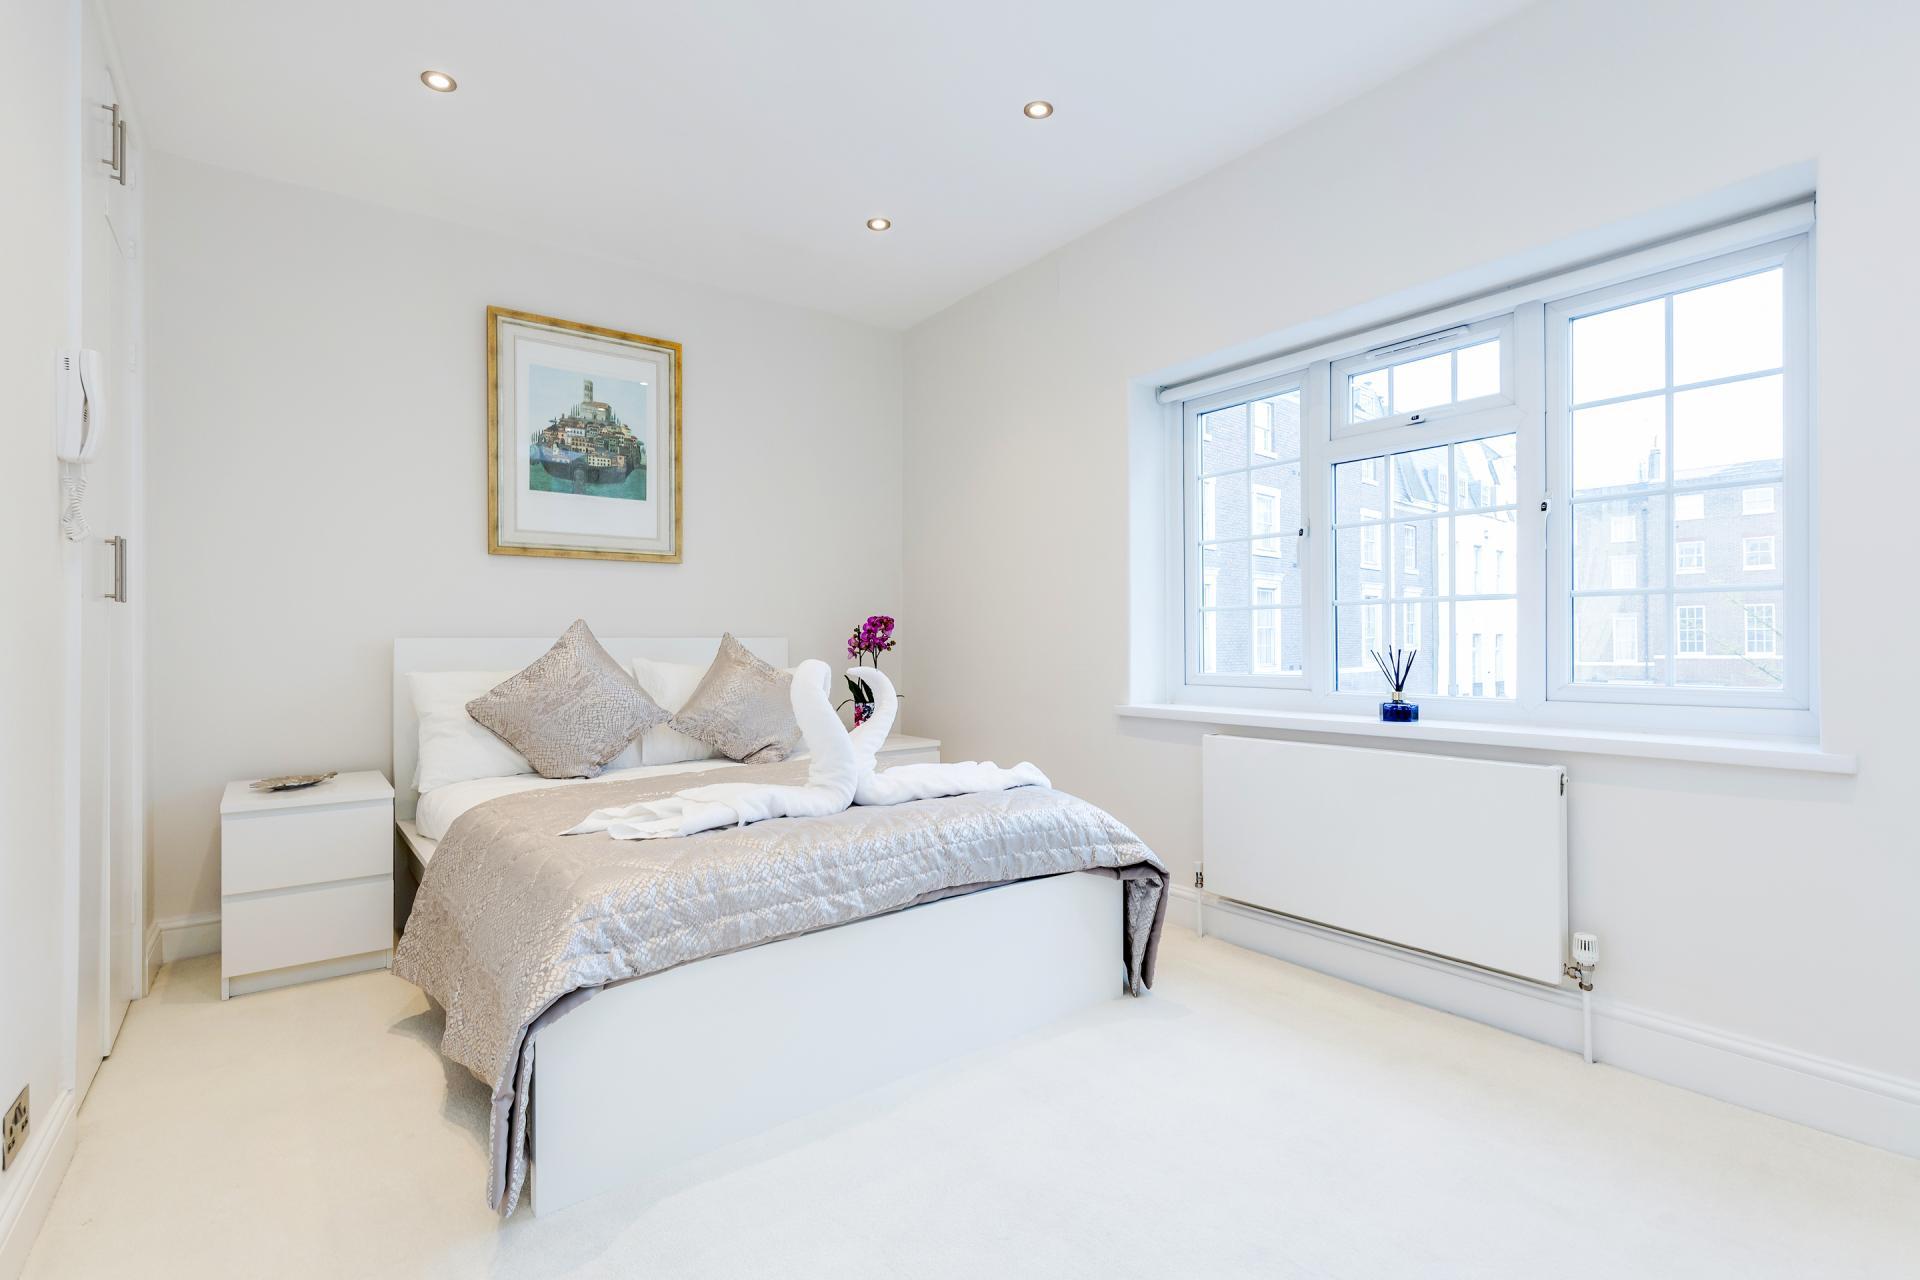 Bedroom at Mayfair House, Mayfair, London